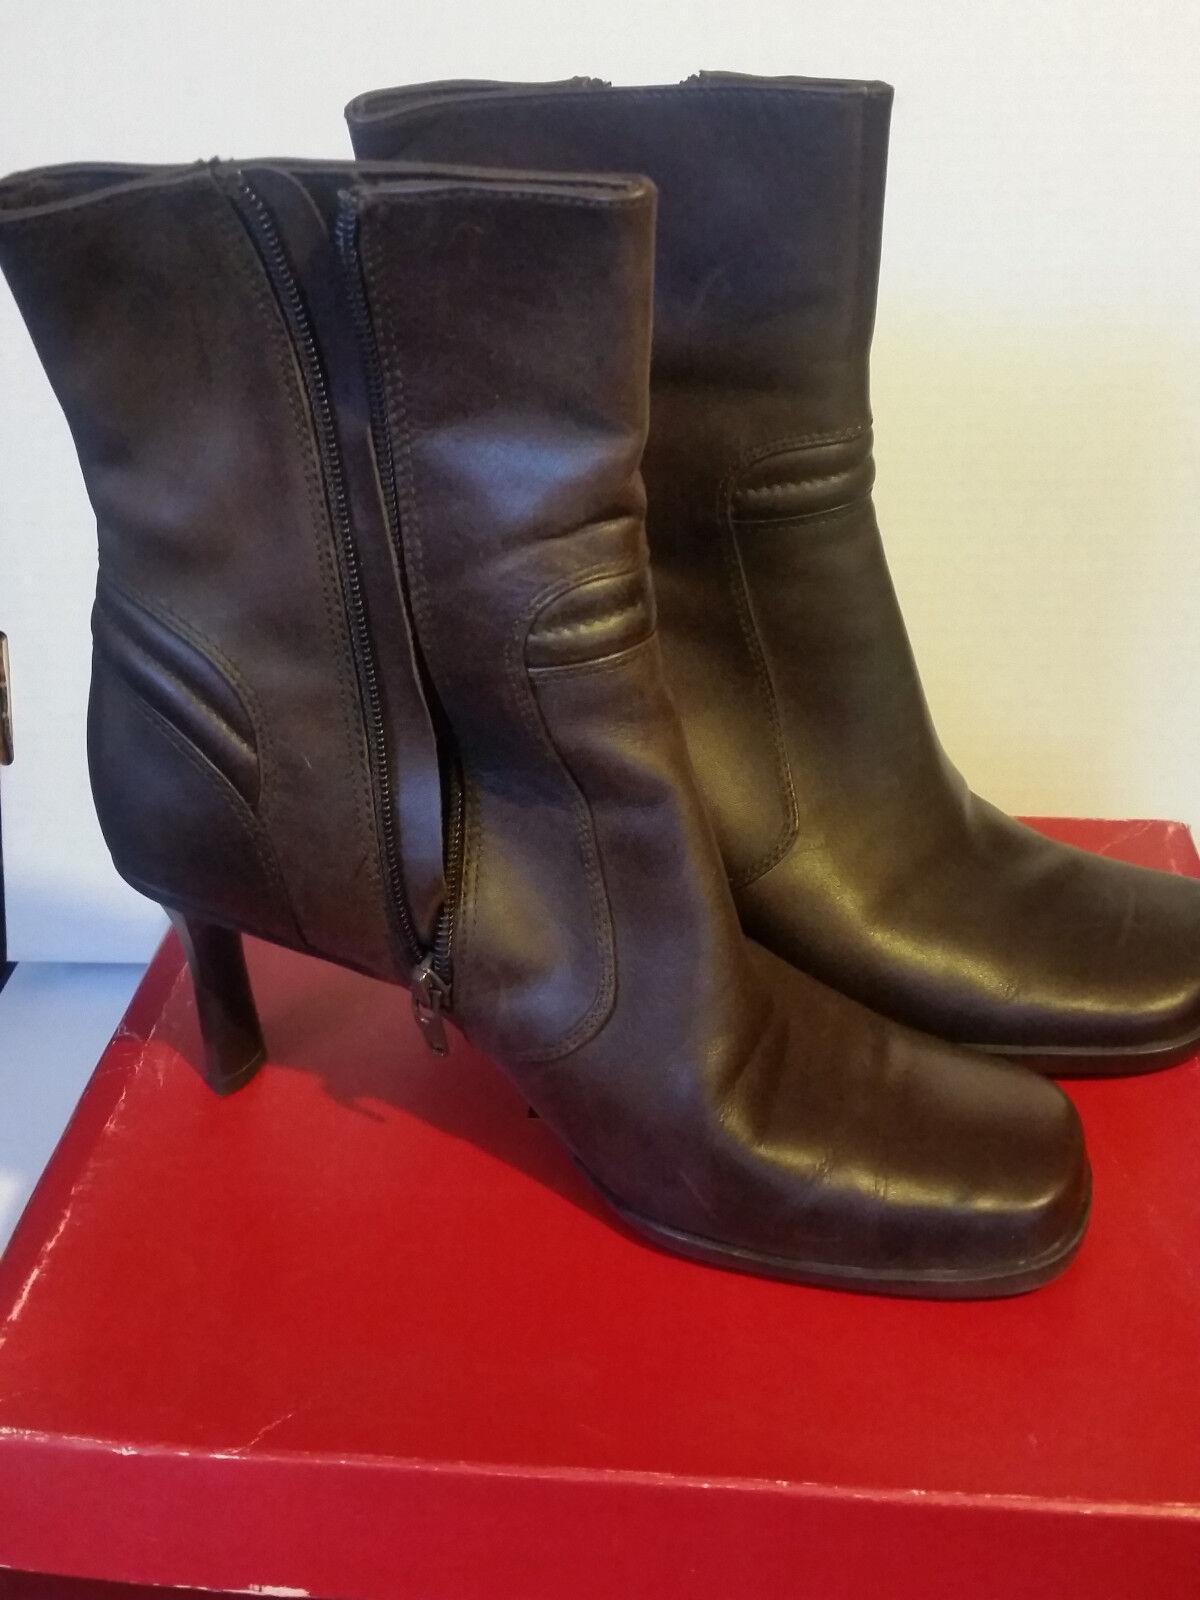 Victoria Spenser Debbie Brown High Heel Leather Boots Womens Size 8.5 M